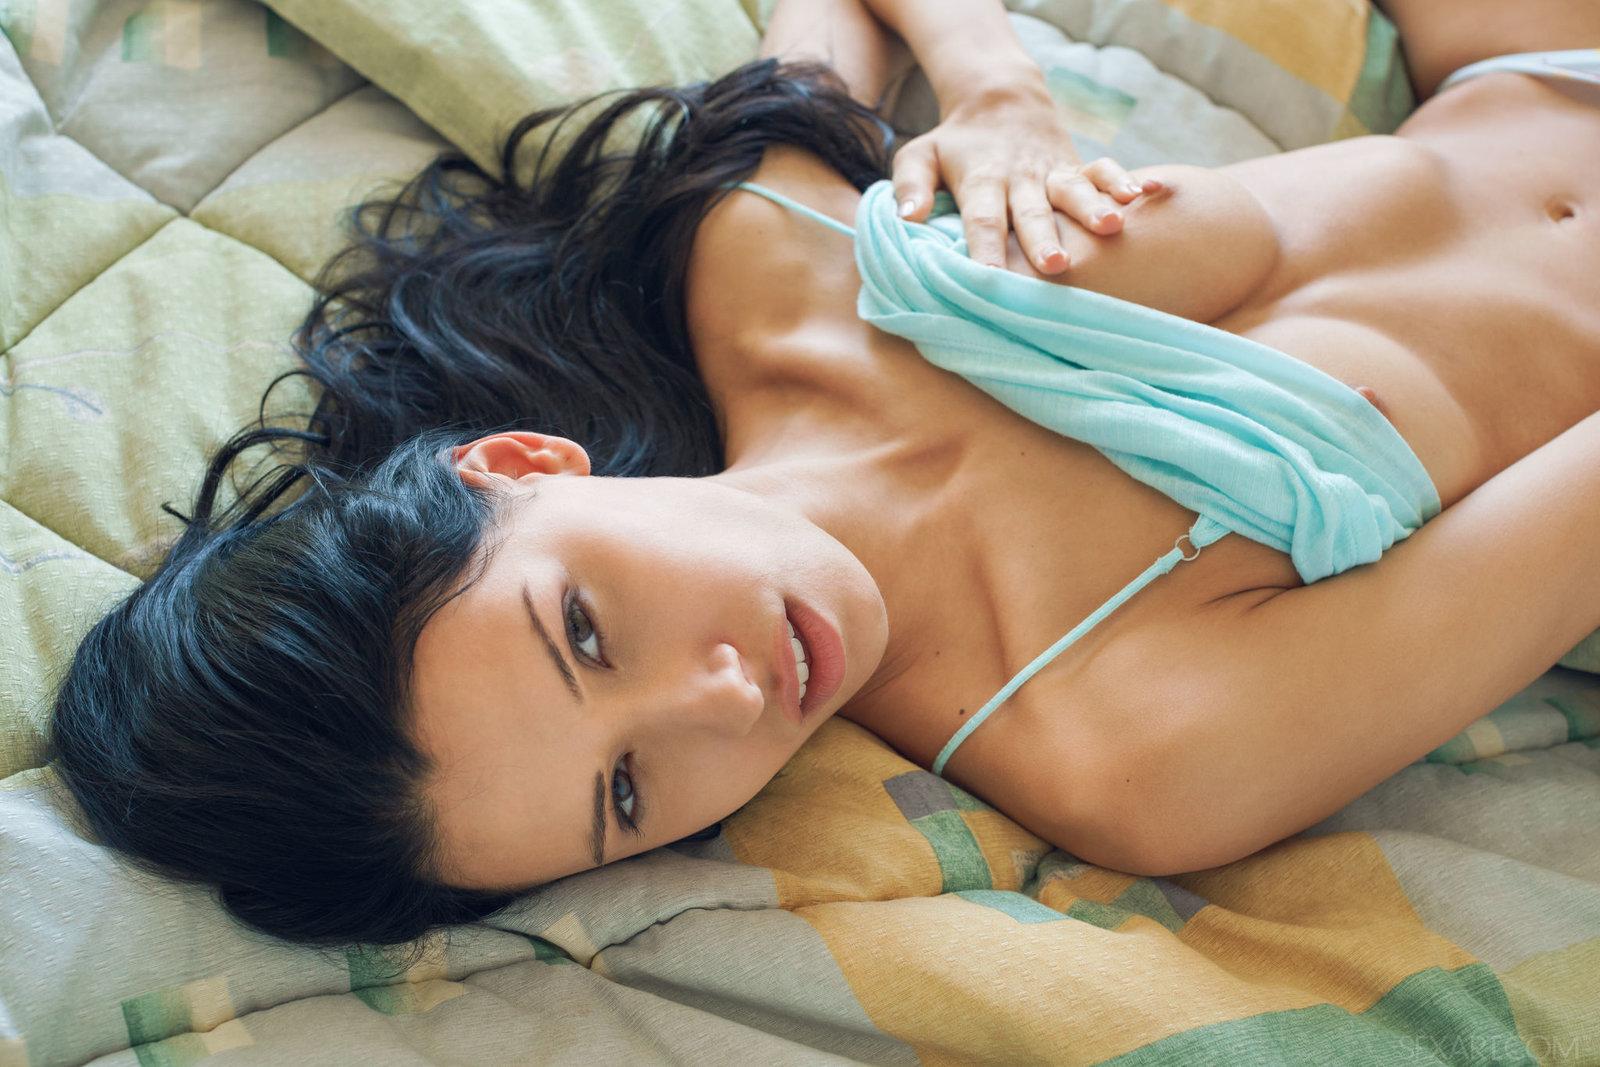 Zdjęcie porno - 094 - Chuda łania na łóżku